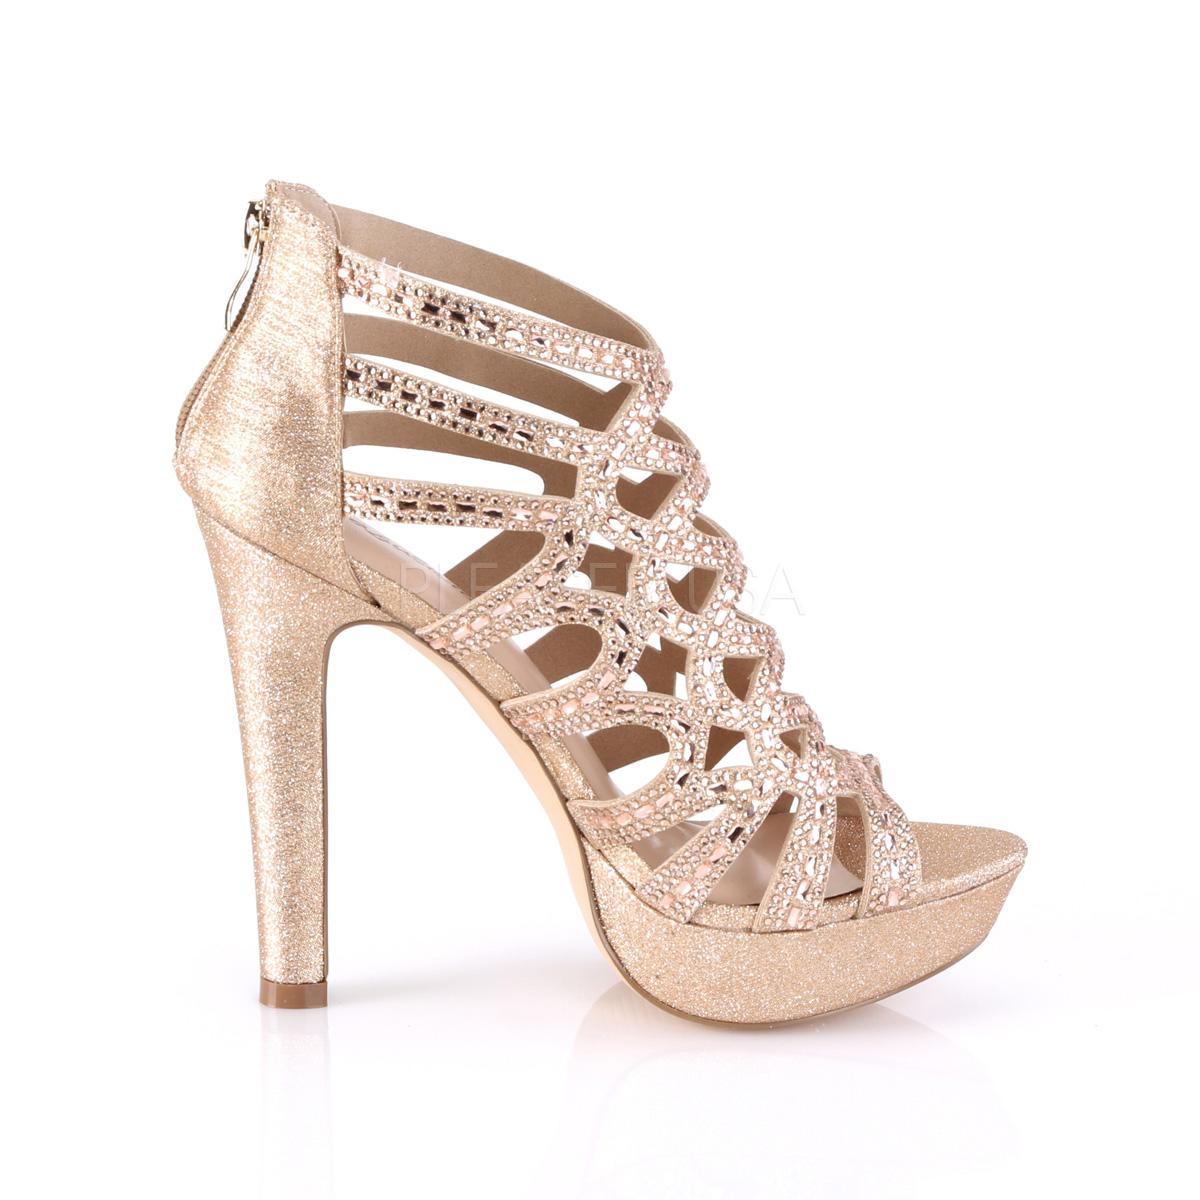 Prata 11,5 cm Pleaser SELENE 24 Sandálias de salto alto